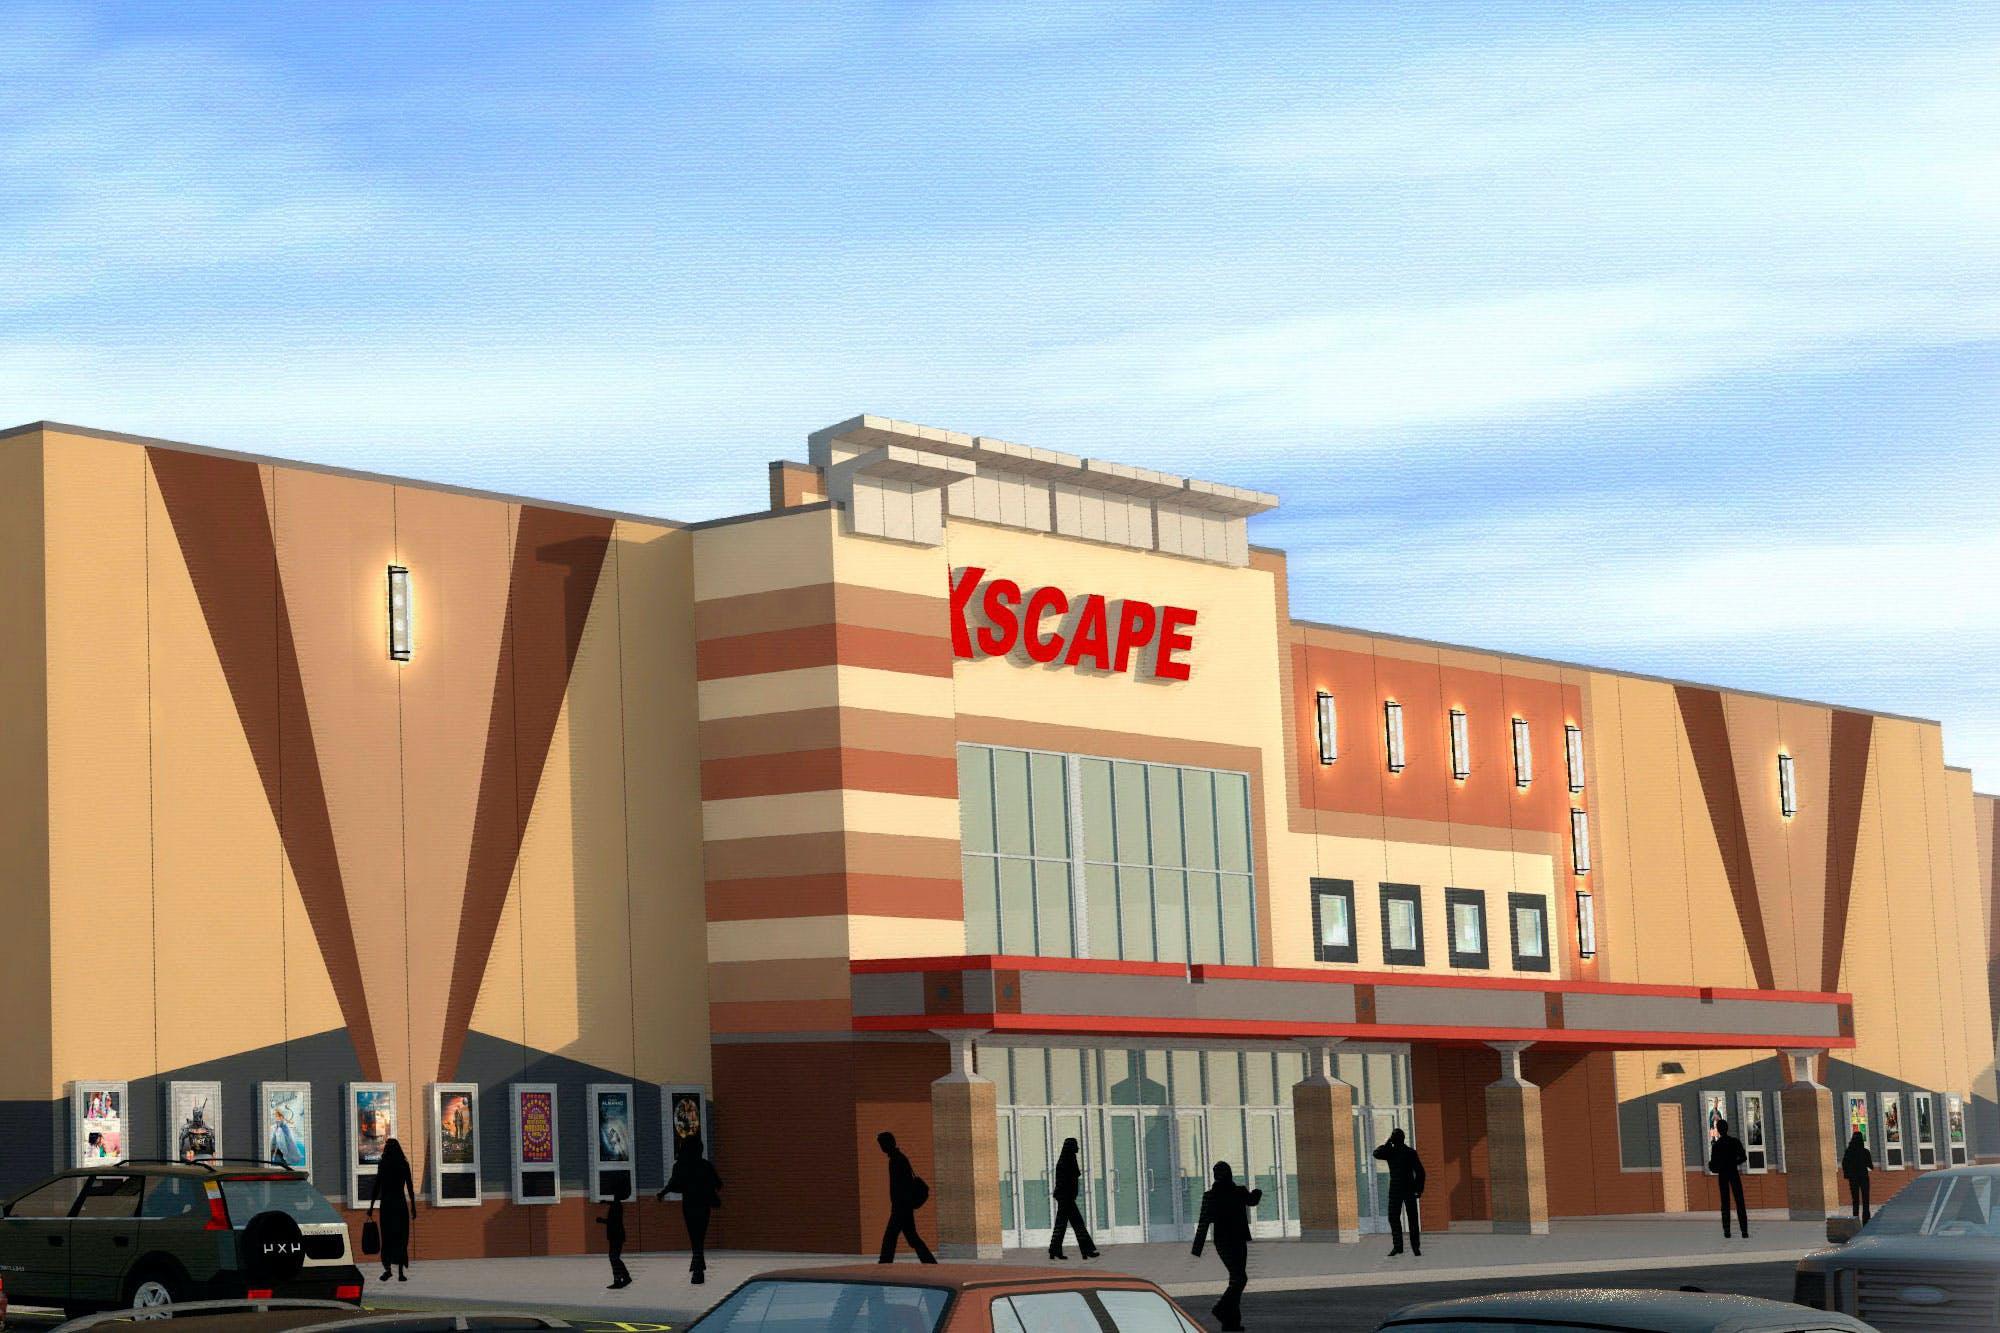 xscape-theater-to-open-in-katy-tx-fulshear-area